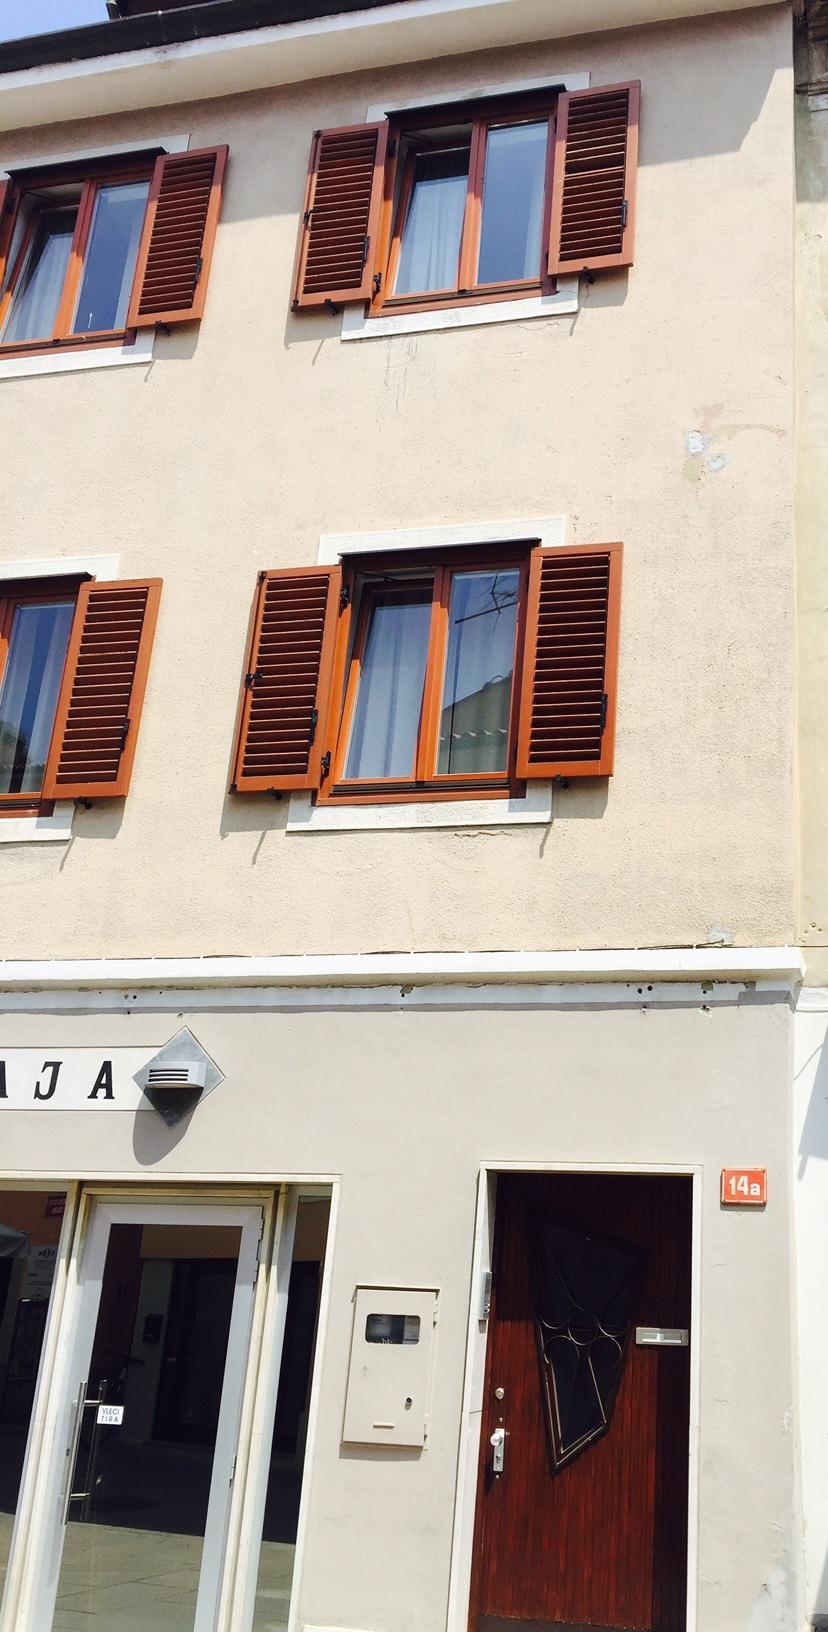 Vanja from Izola